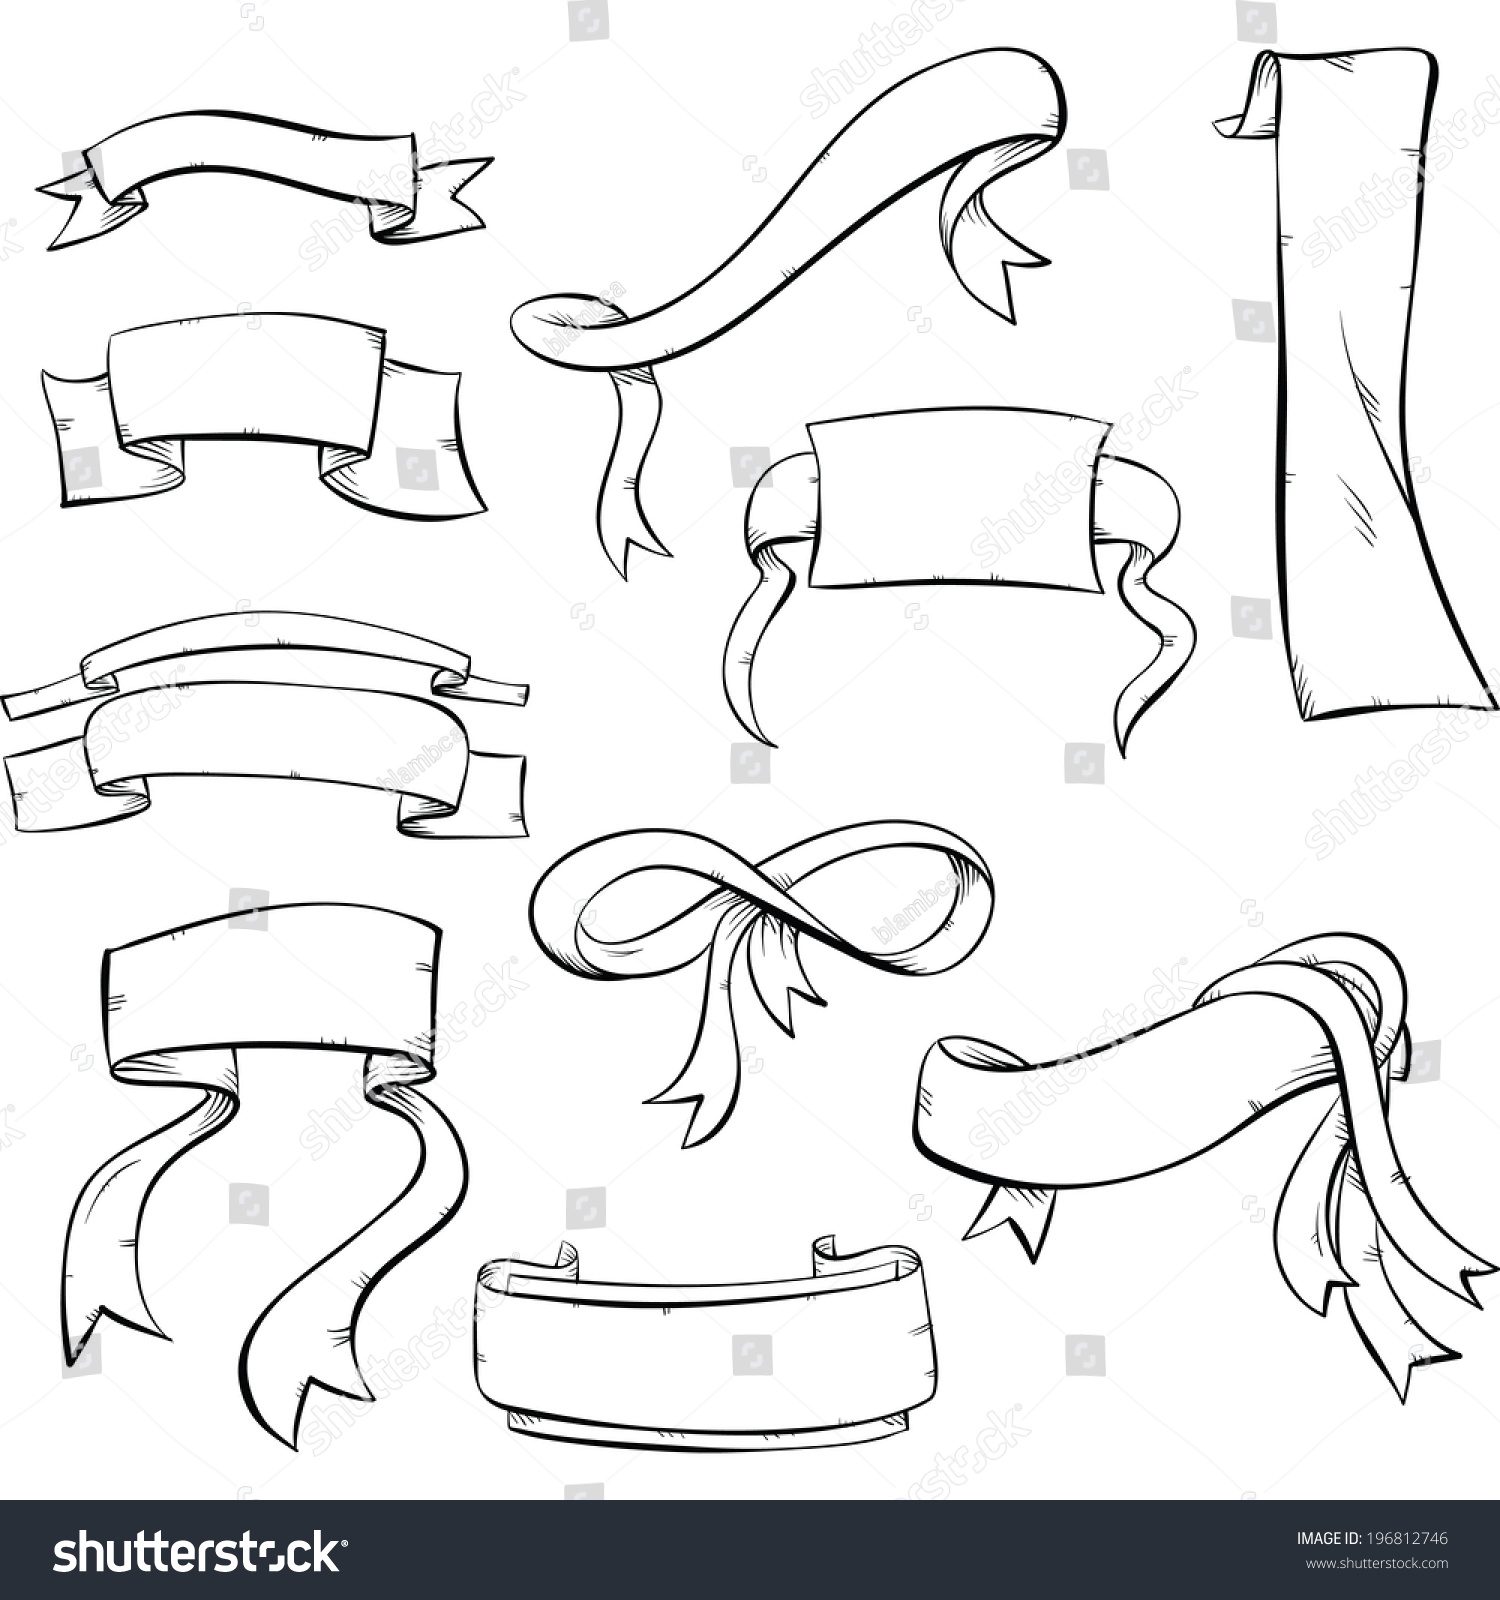 Line Art Ribbon : Set cartoon line art ribbons banners stock vector